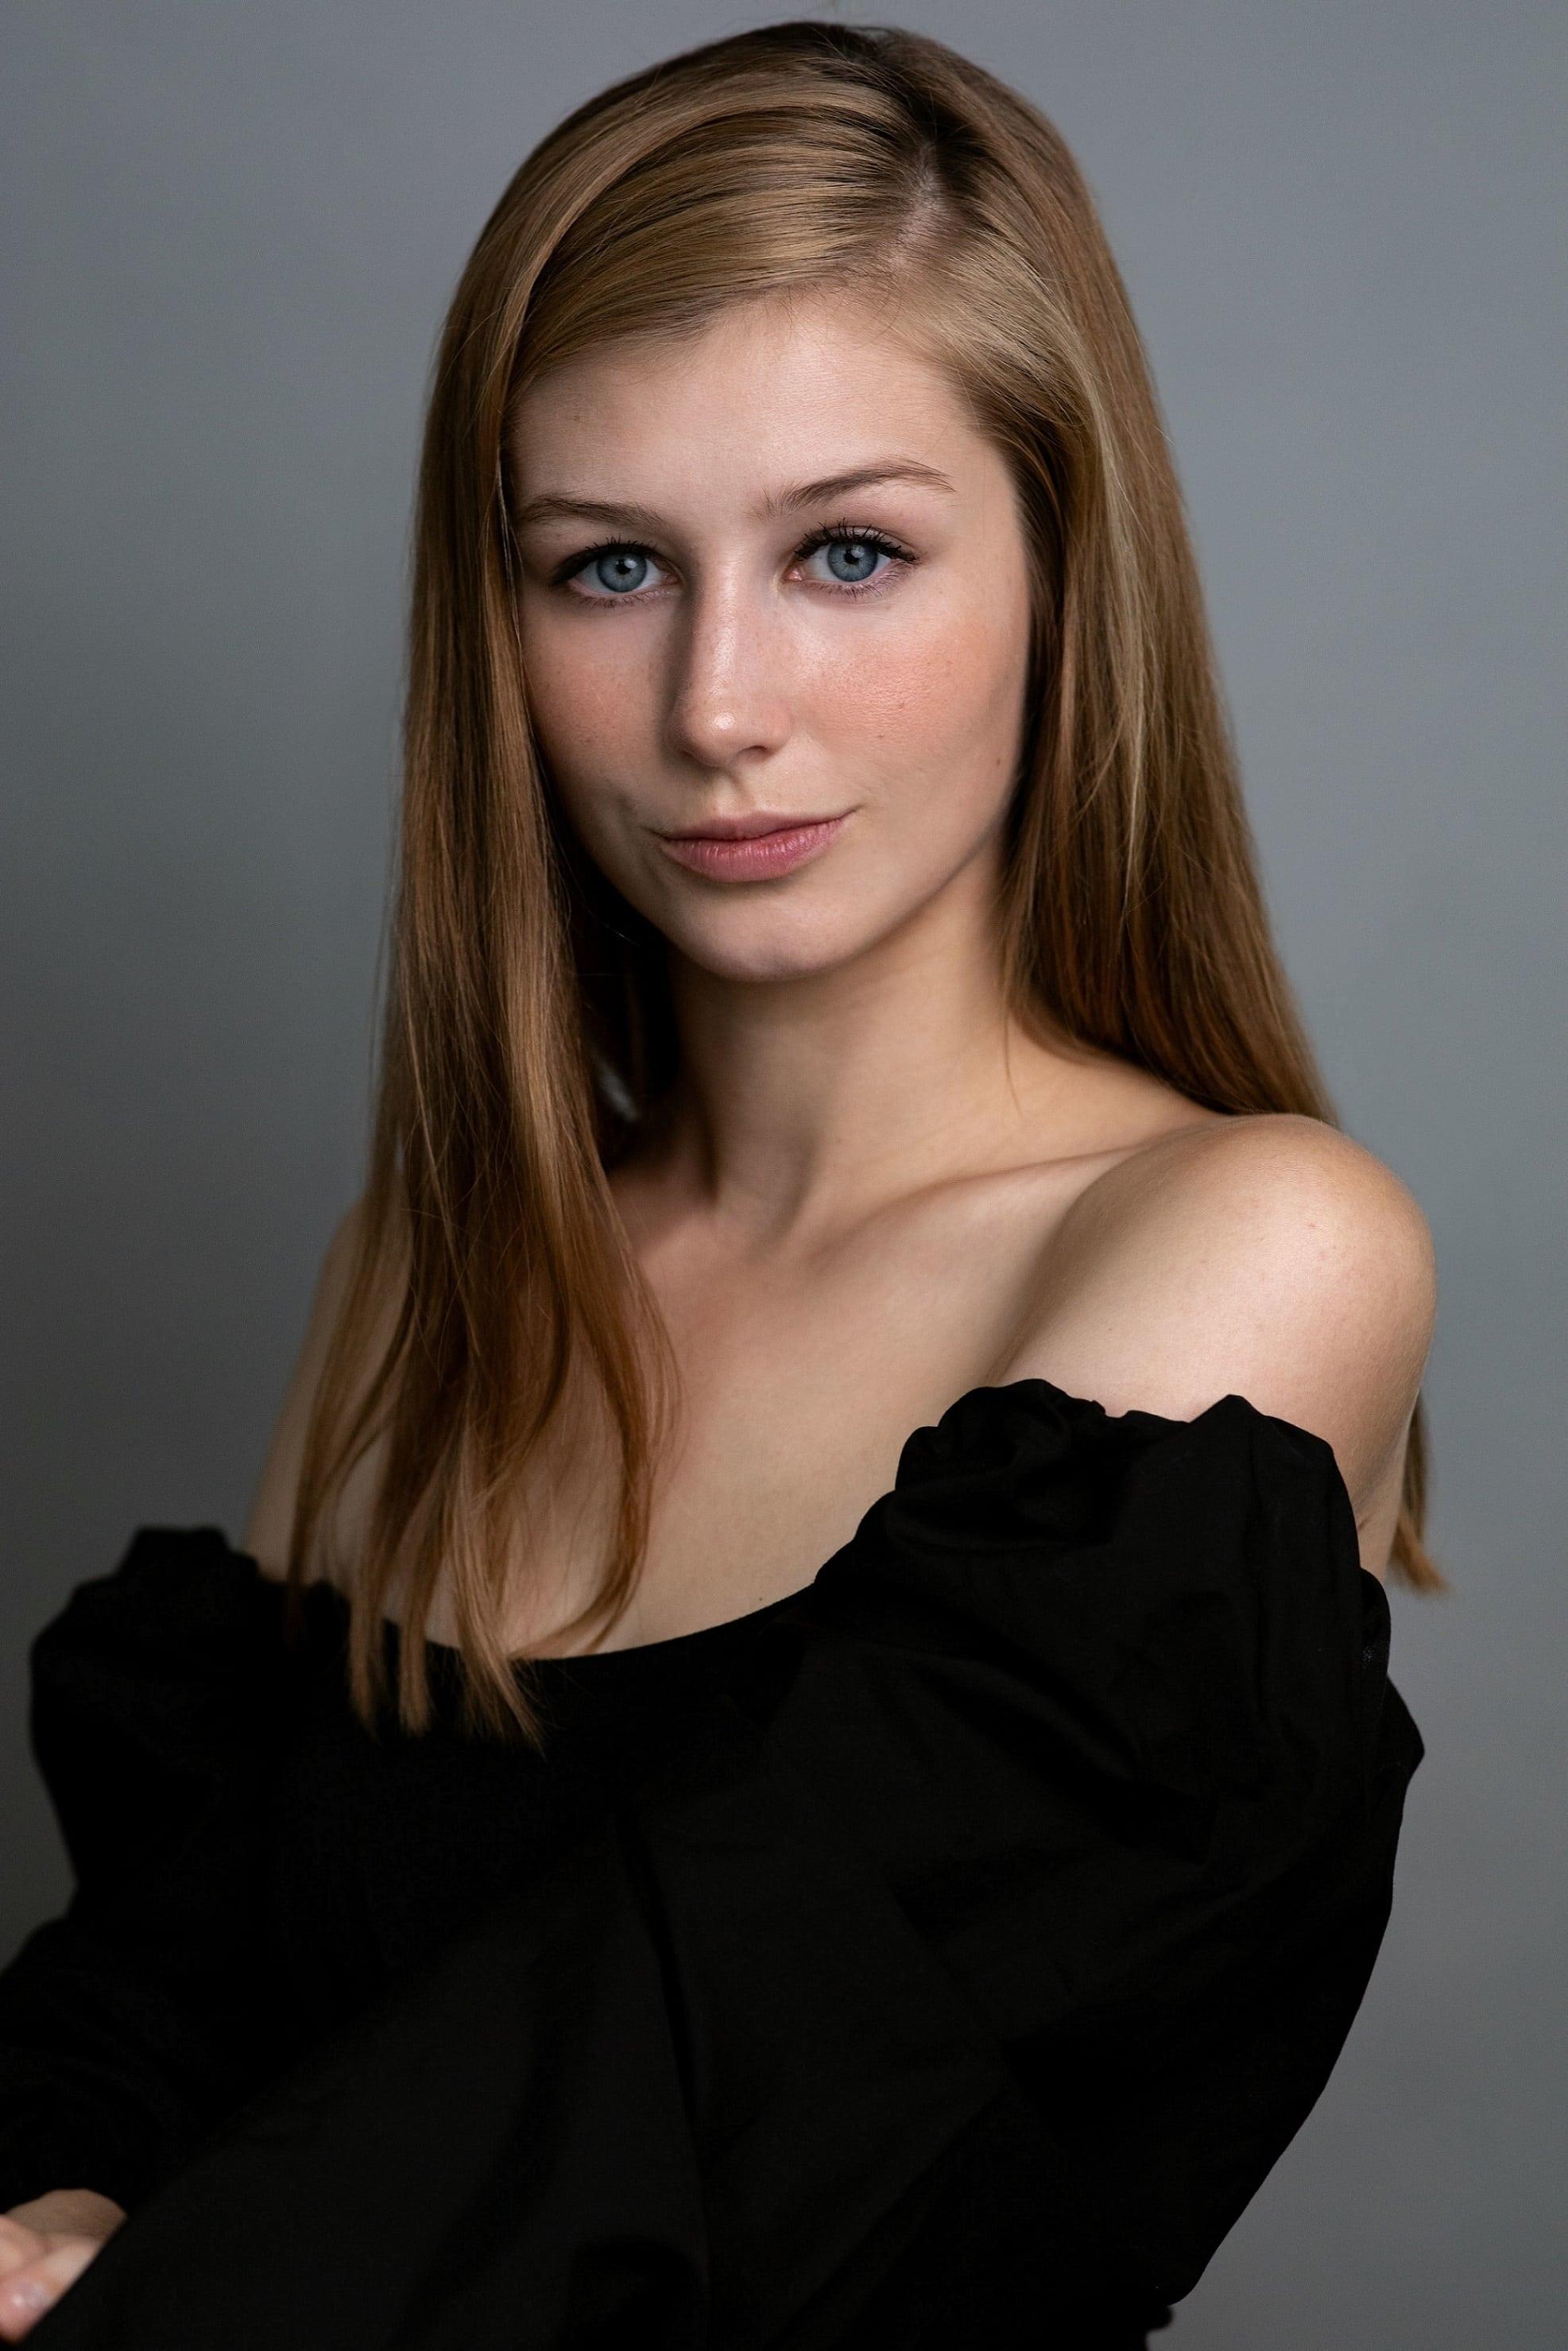 Tara Redmond van Rees